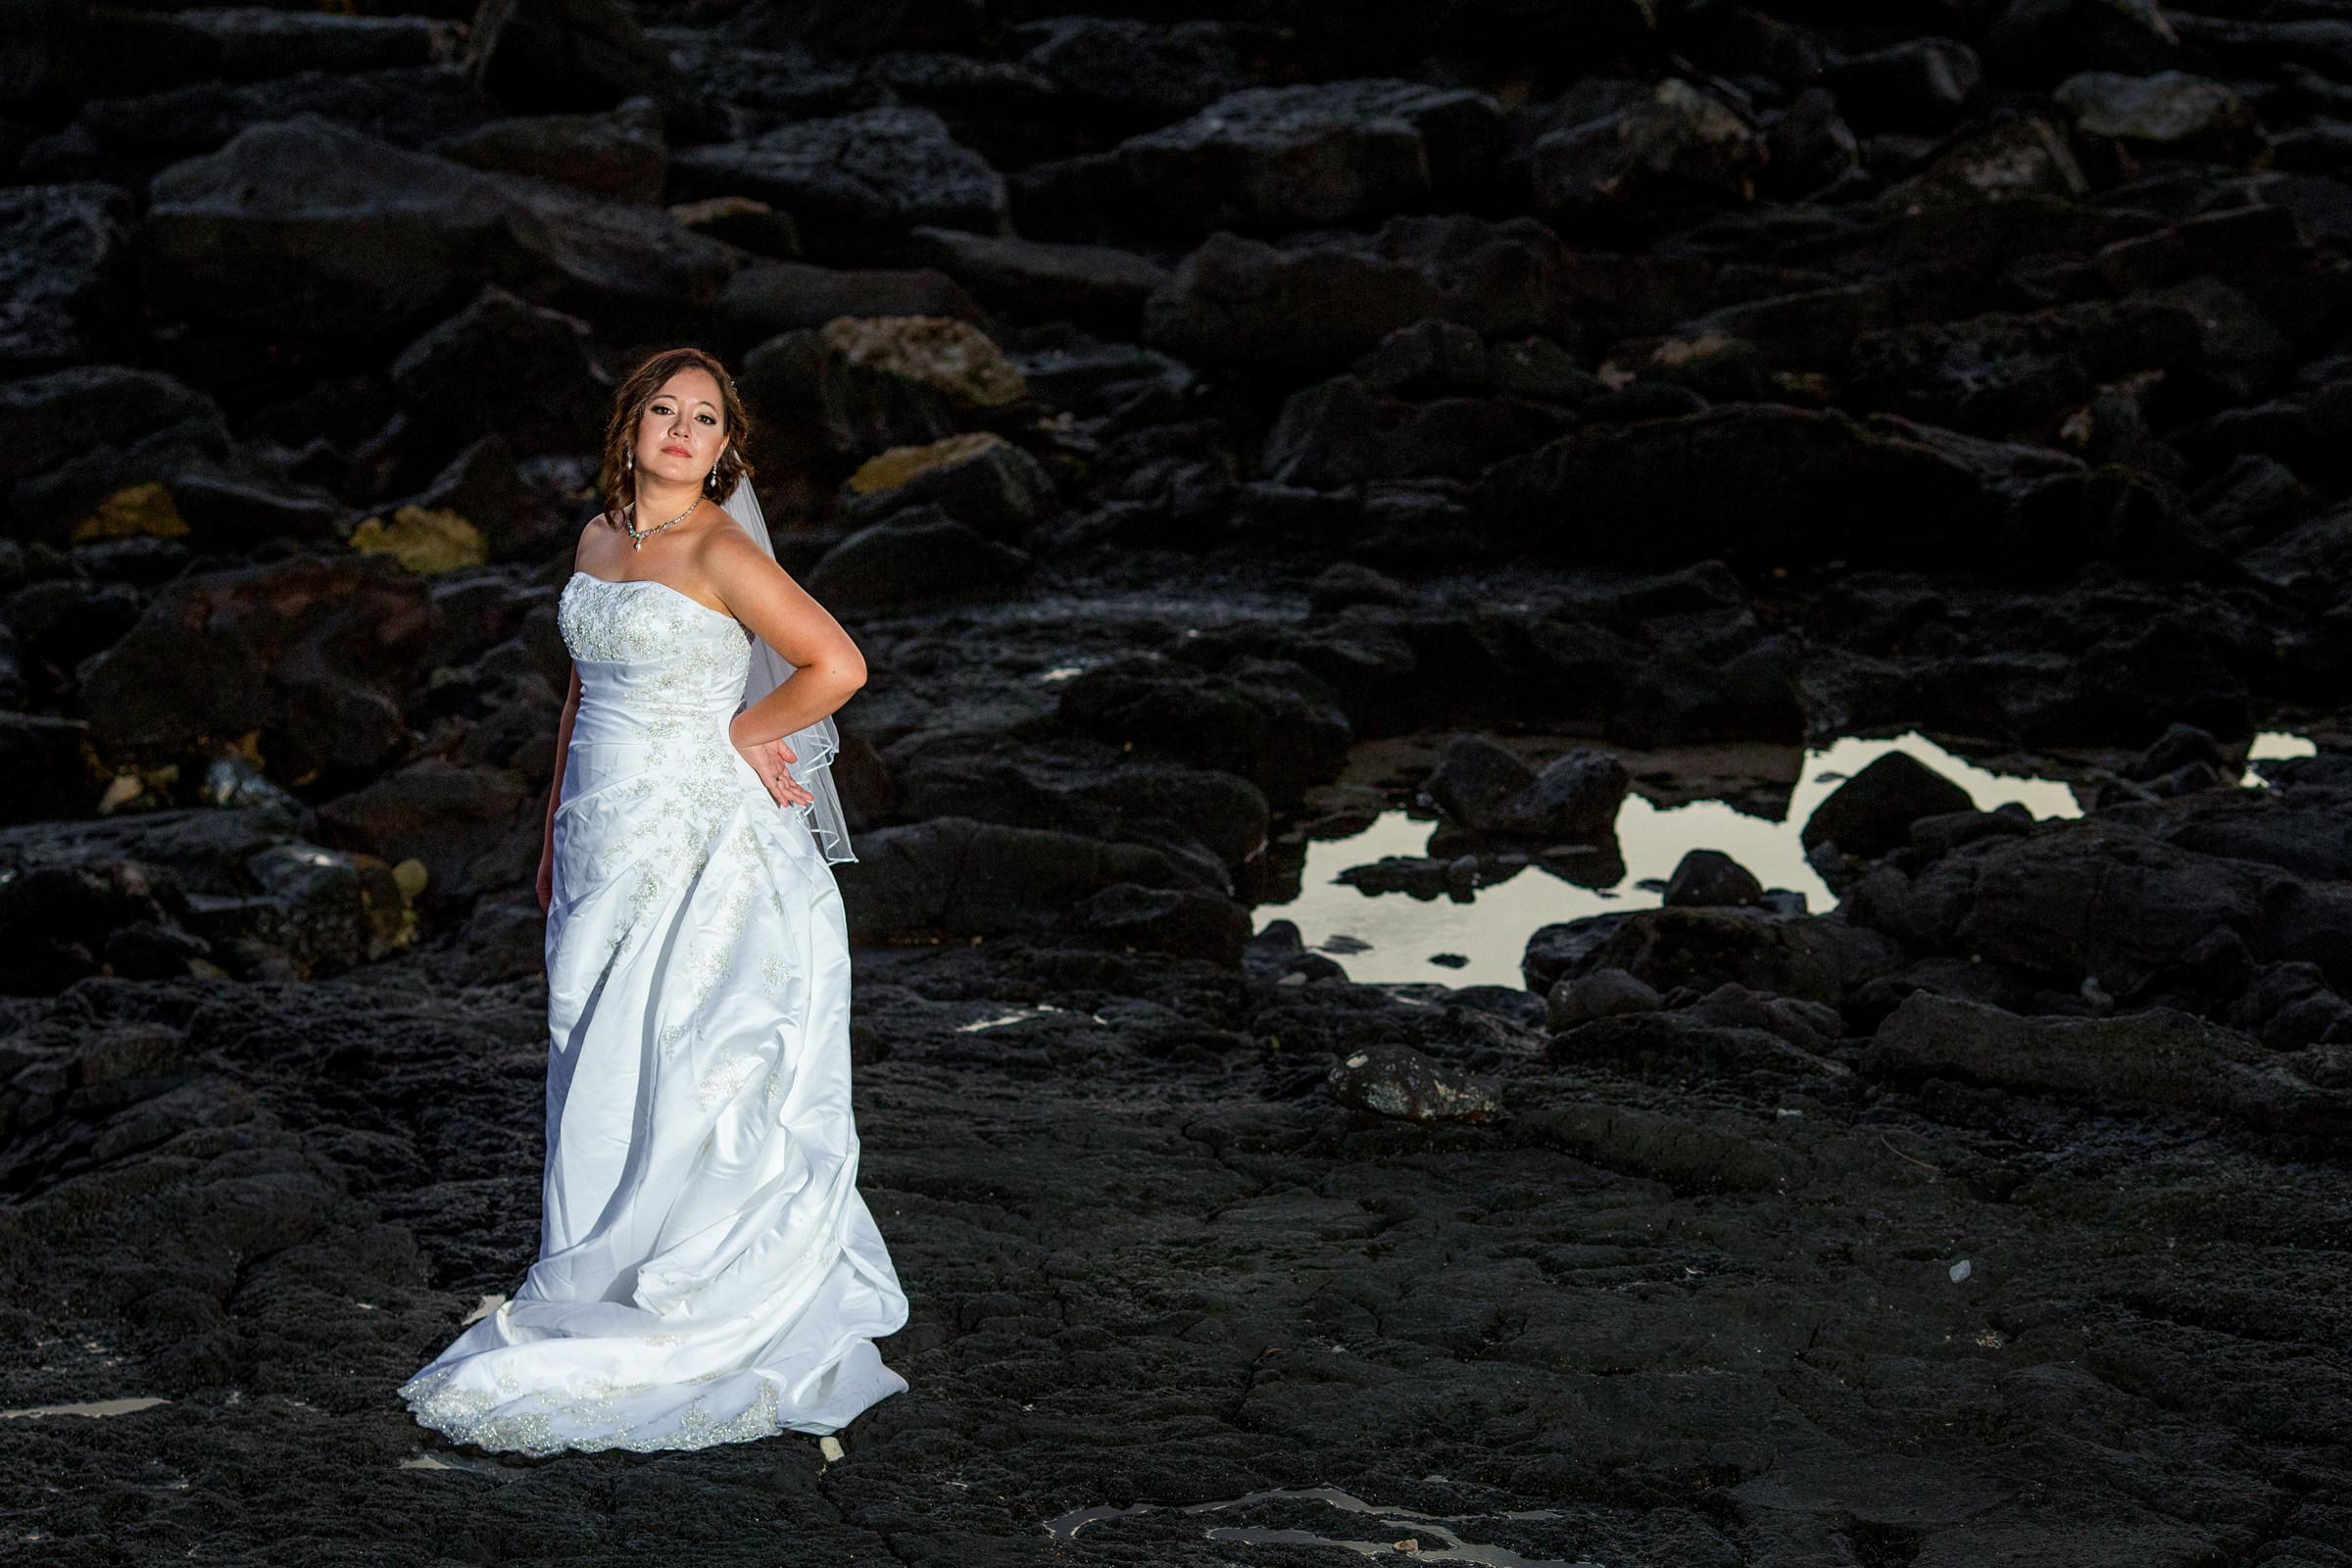 wedding-photographer-photography-destination-hawaii-lake-tahoe-bride-groom-portrait